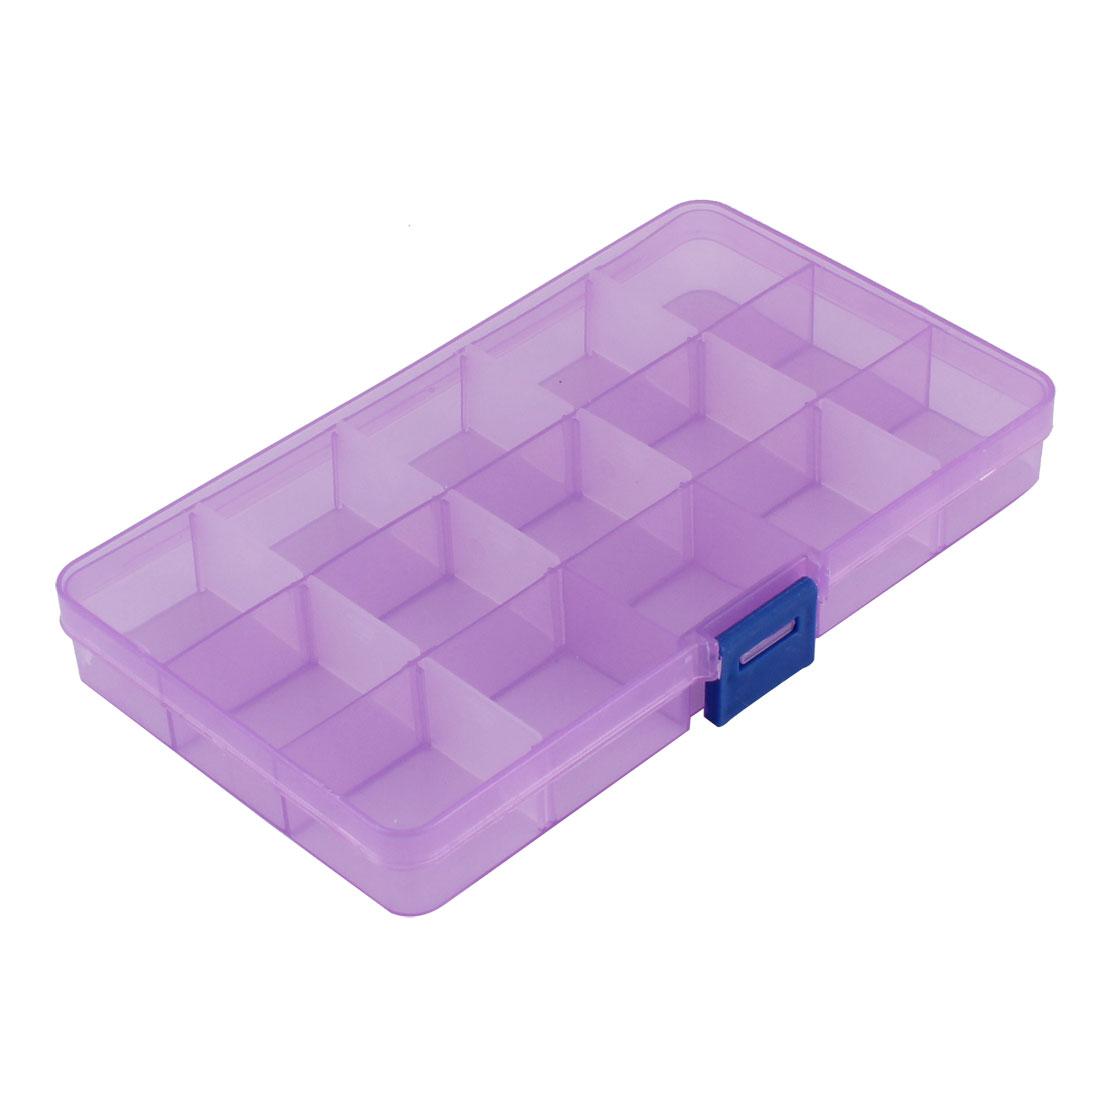 Medicine Jewellery Plastic 15 Slots Storage Box Case Organizer Container Clear Purple